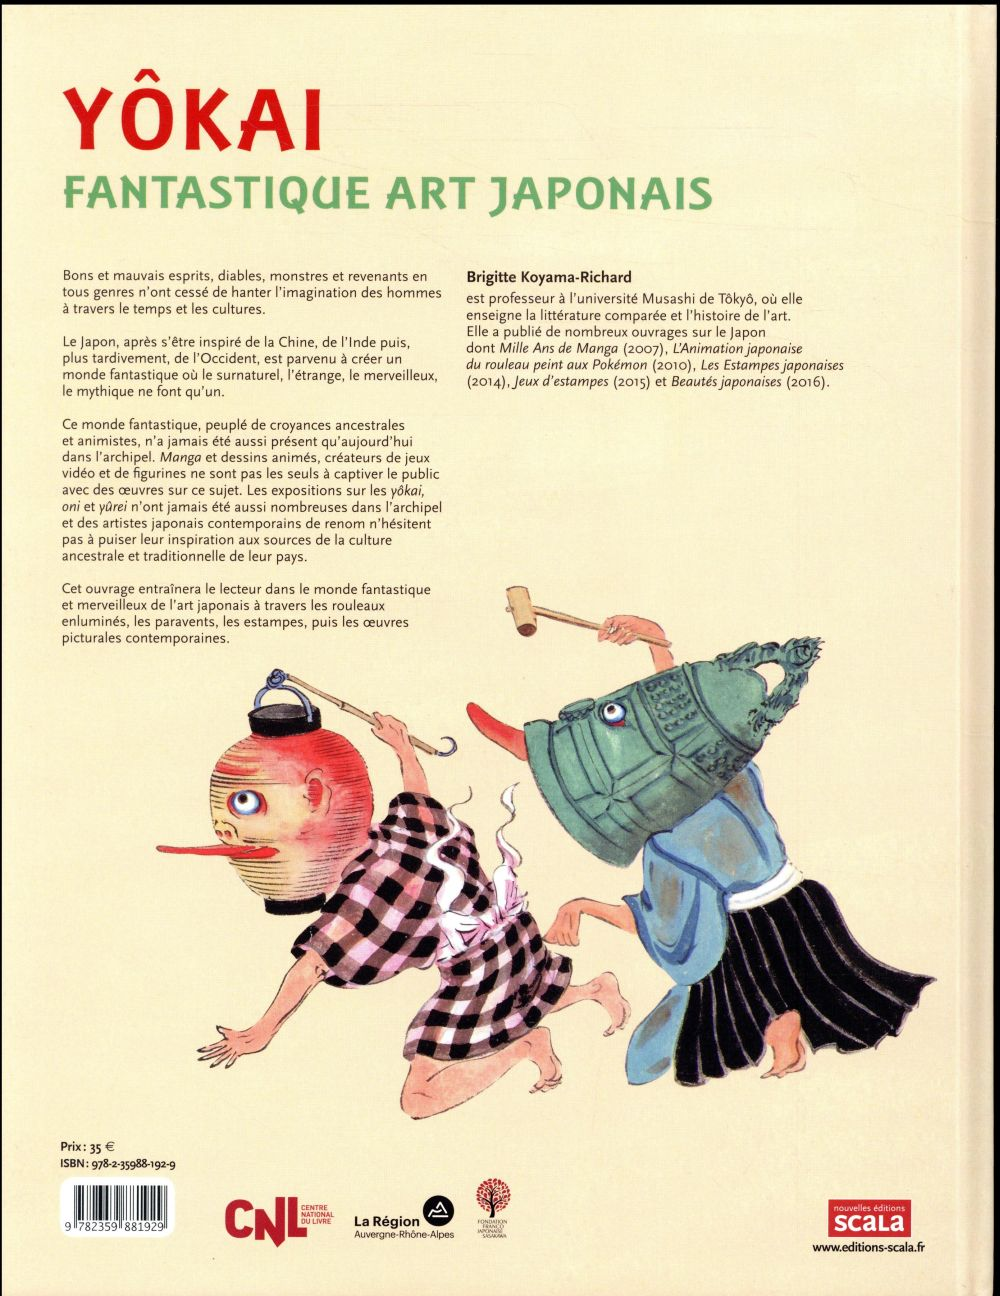 Yokai fantastique art japonais